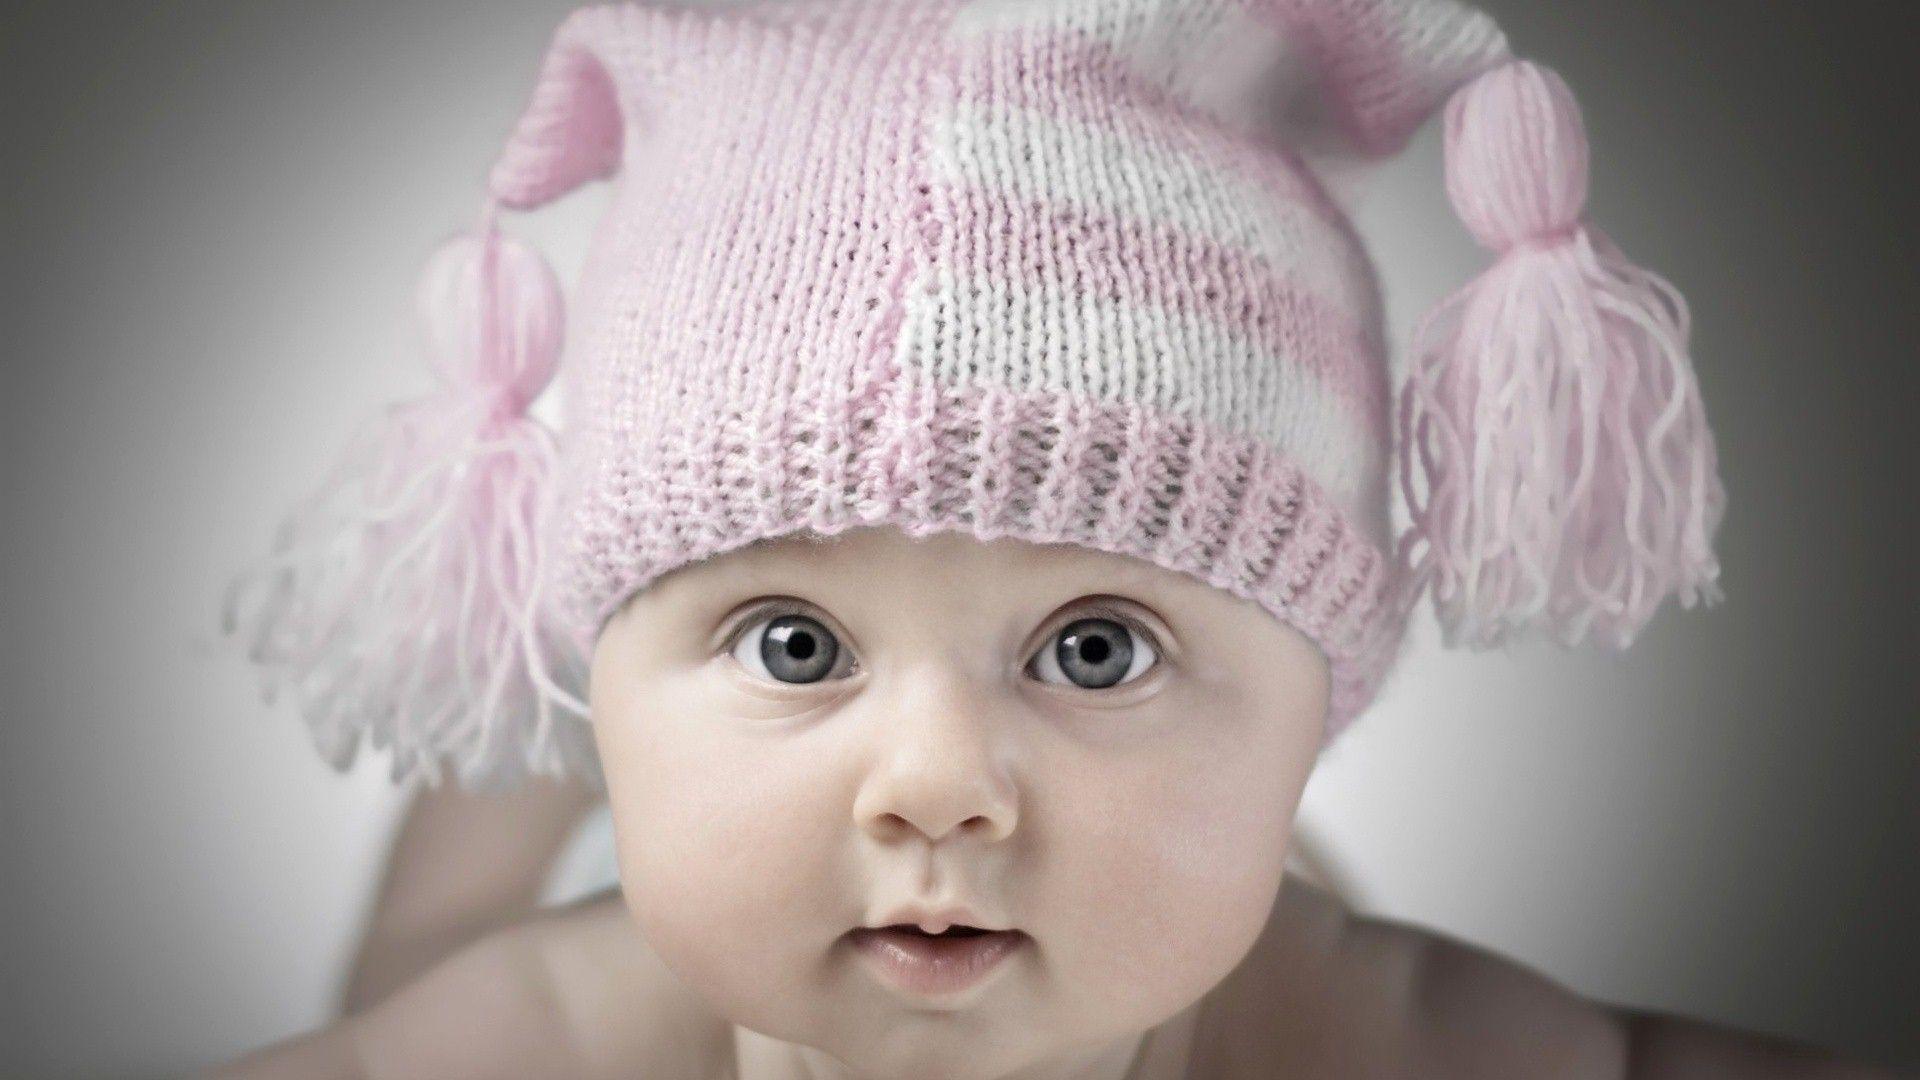 Cute Baby Image Free Download Wallpaper Hd Cute Baby Boy